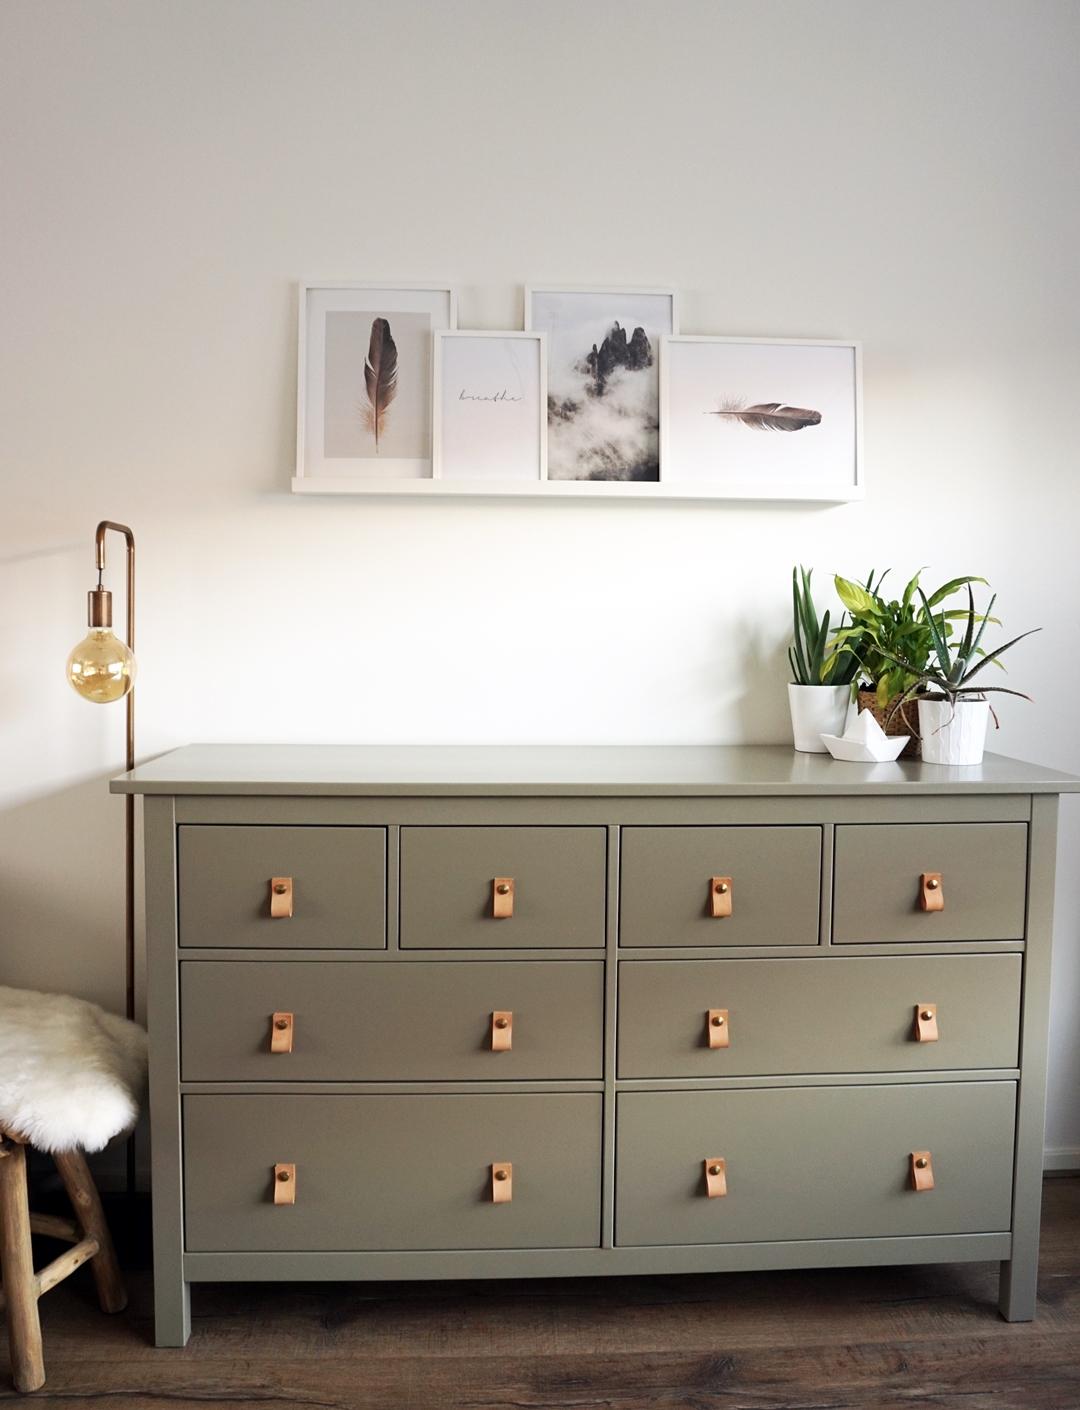 Diy Ikea Hemnes Opknappen Desenio Posters Beautyill